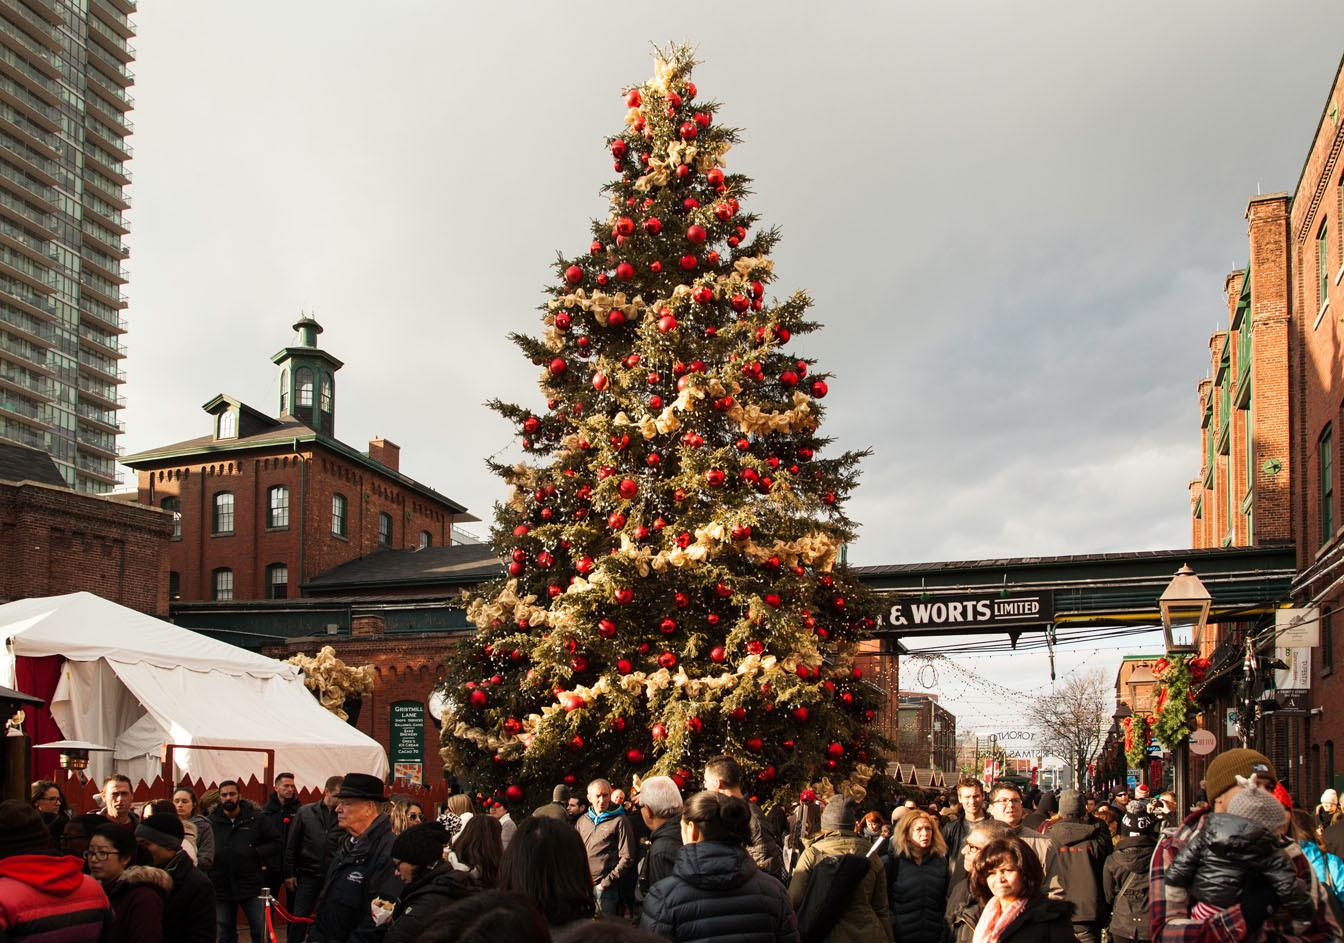 多伦多圣诞市场(TORONTO CHRISTMAS MARKET)